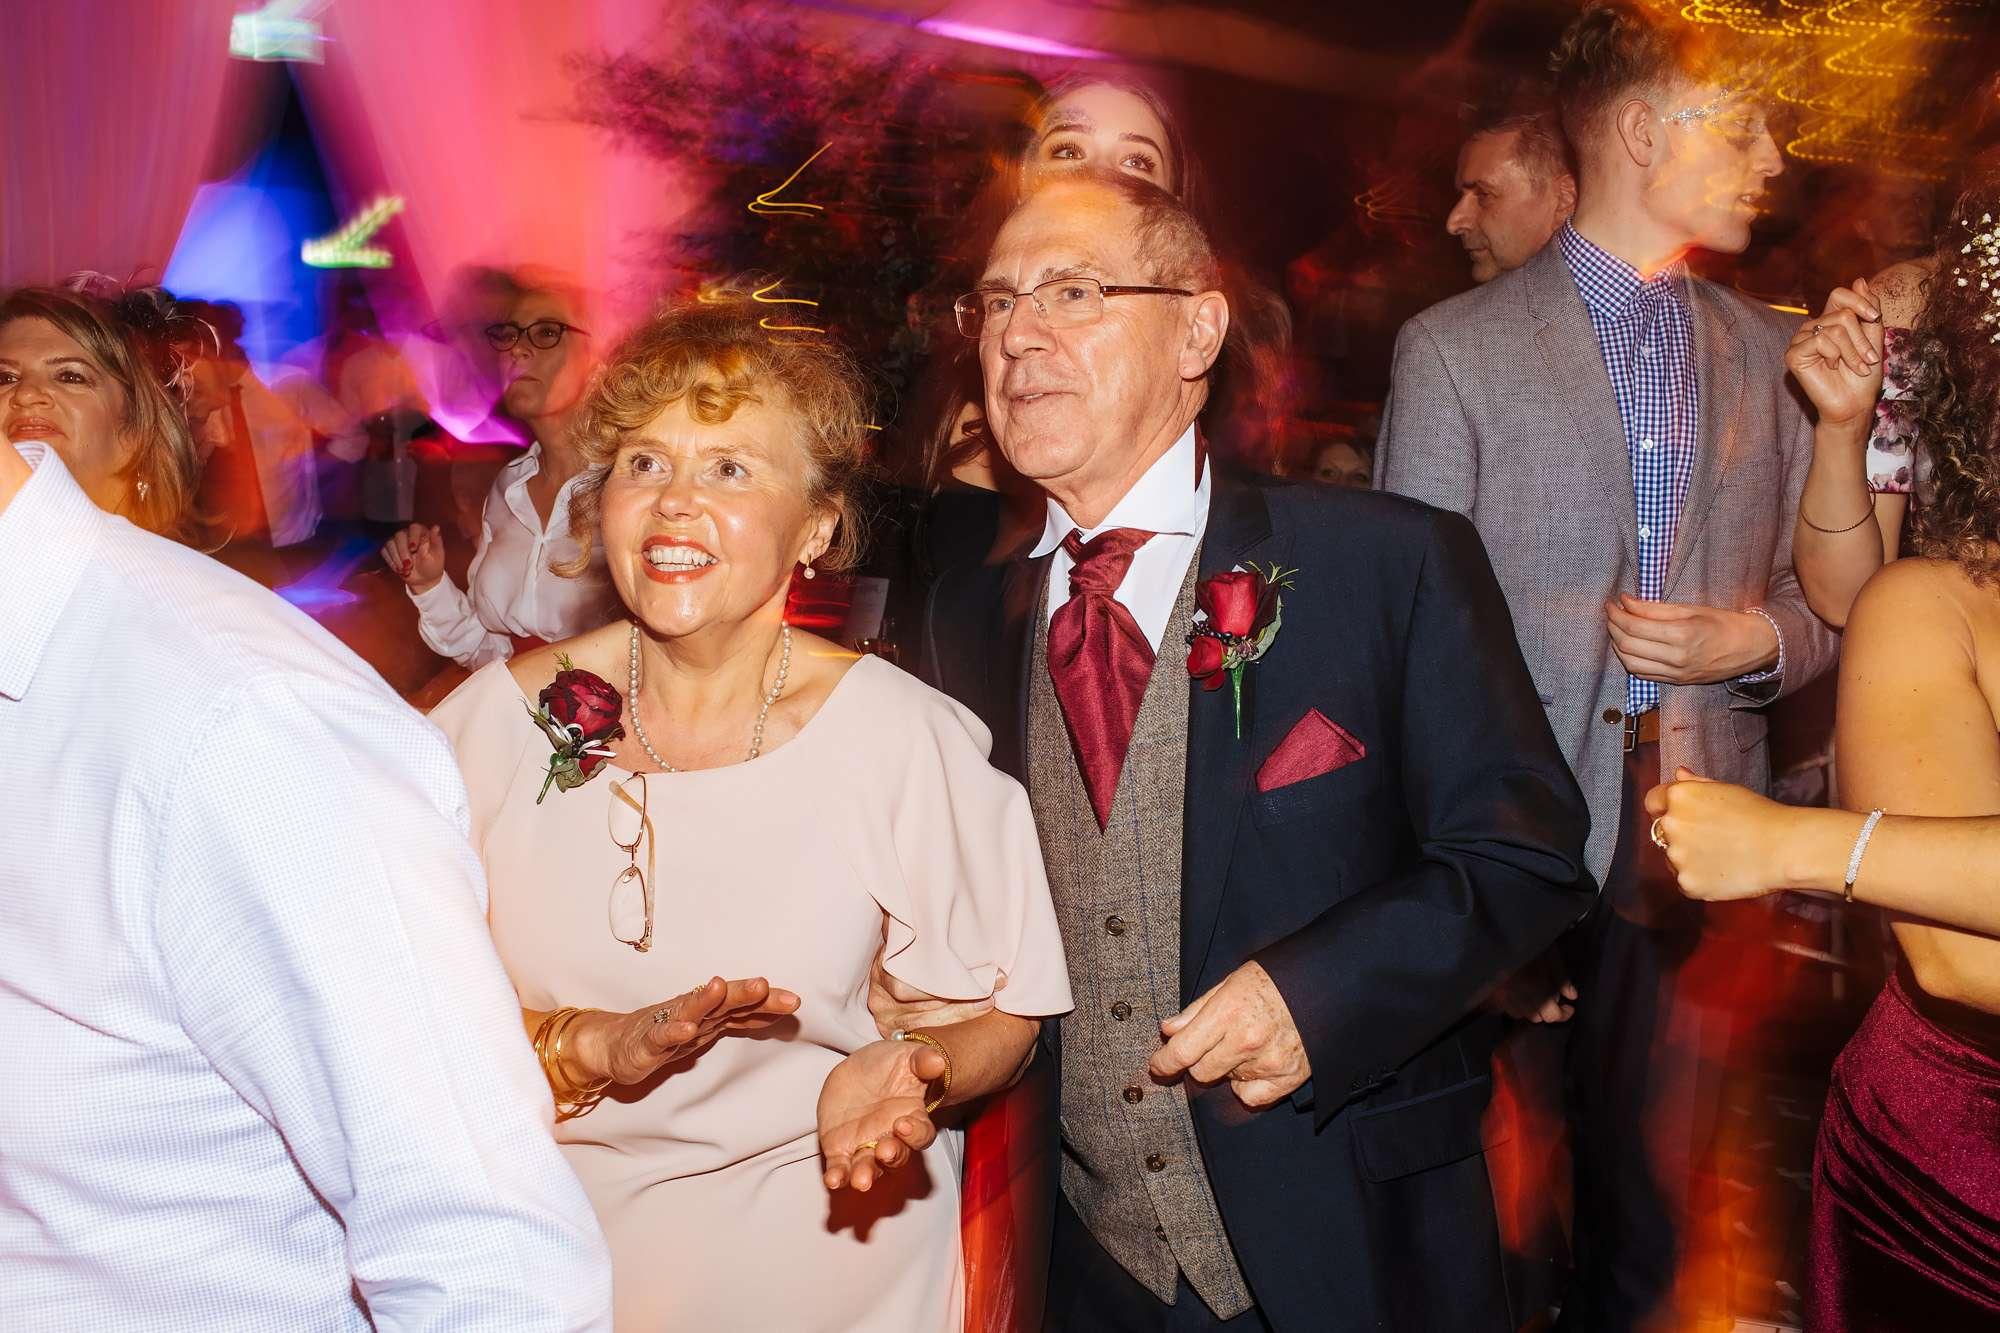 Bride's parents dancing at her wedding in Blackpool